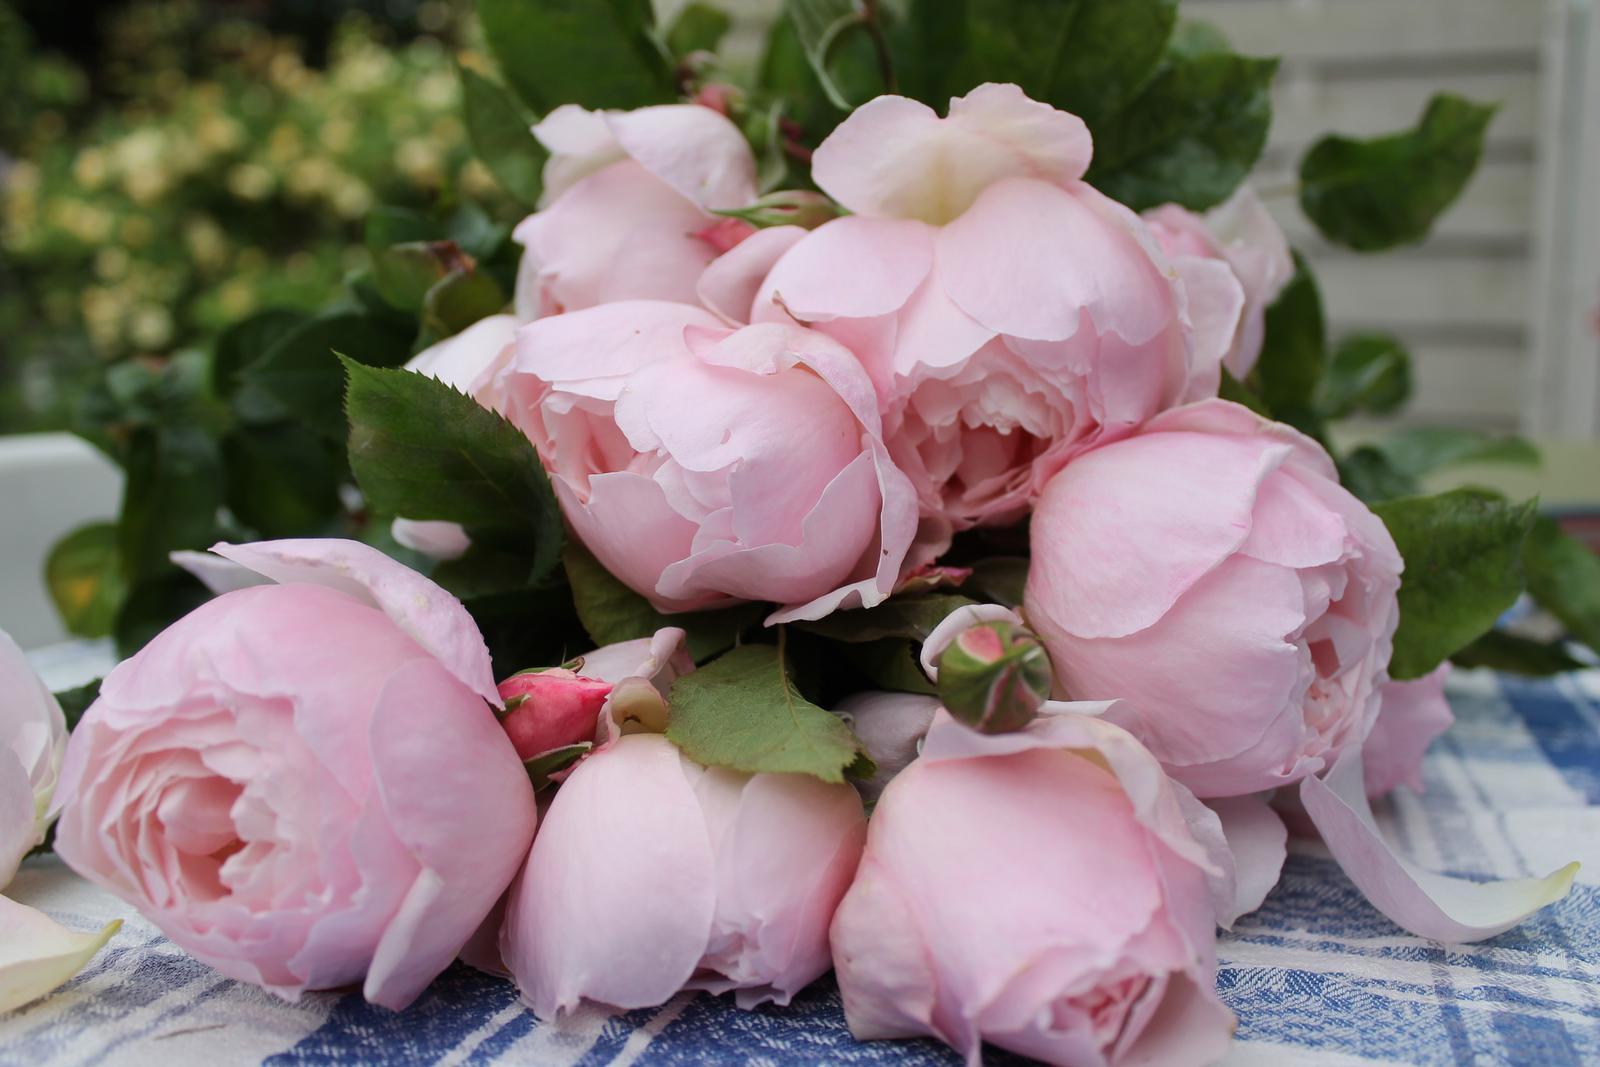 David Austin rosen - The Generous Gardener, zajtra hned objednam..